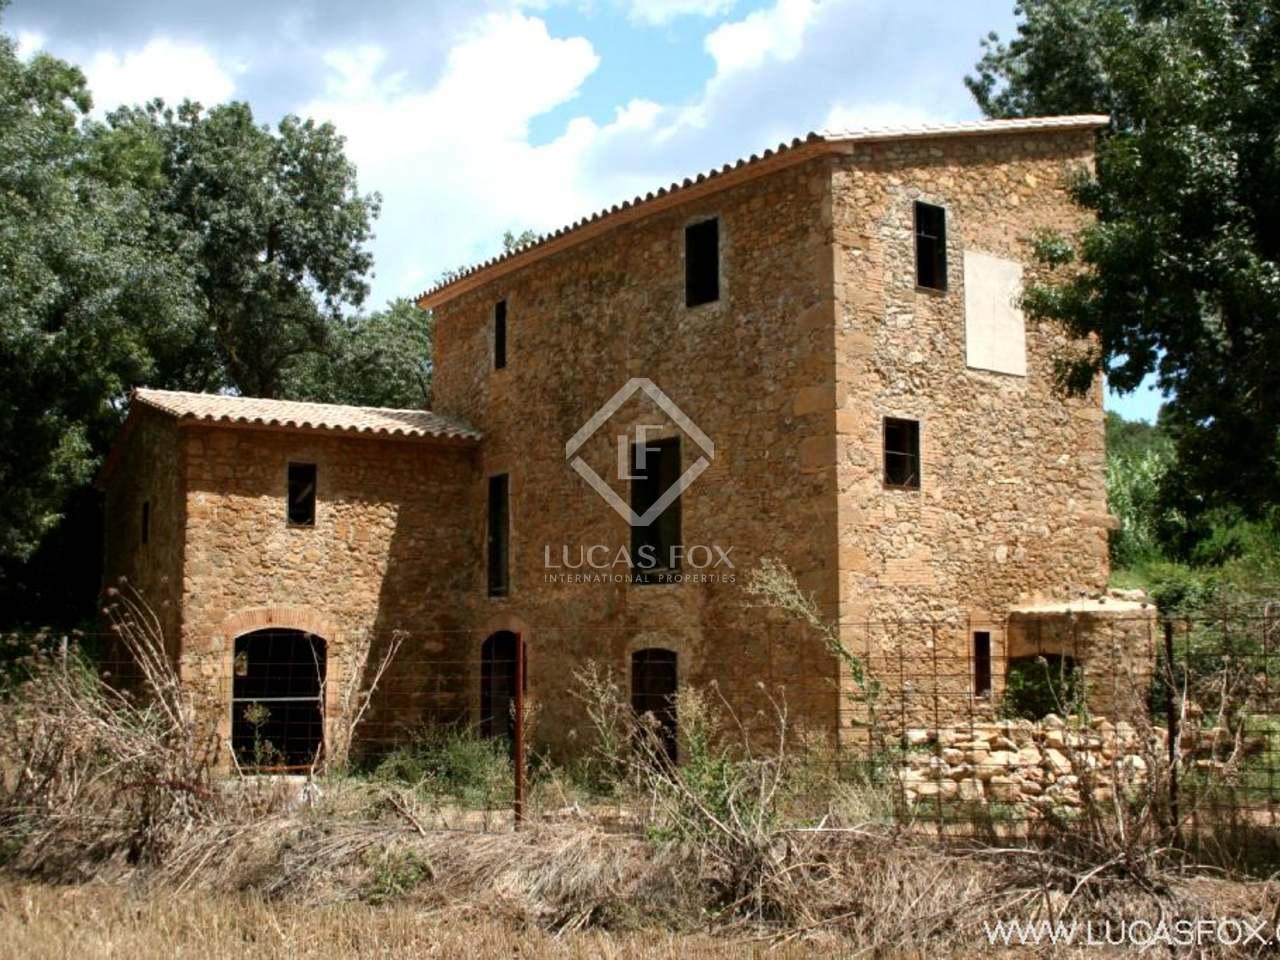 Lovely semi-restored millhouse to buy near La Bisbal d'Emporda in the Baix Emporda, Girona. 7ha of private land. : 1